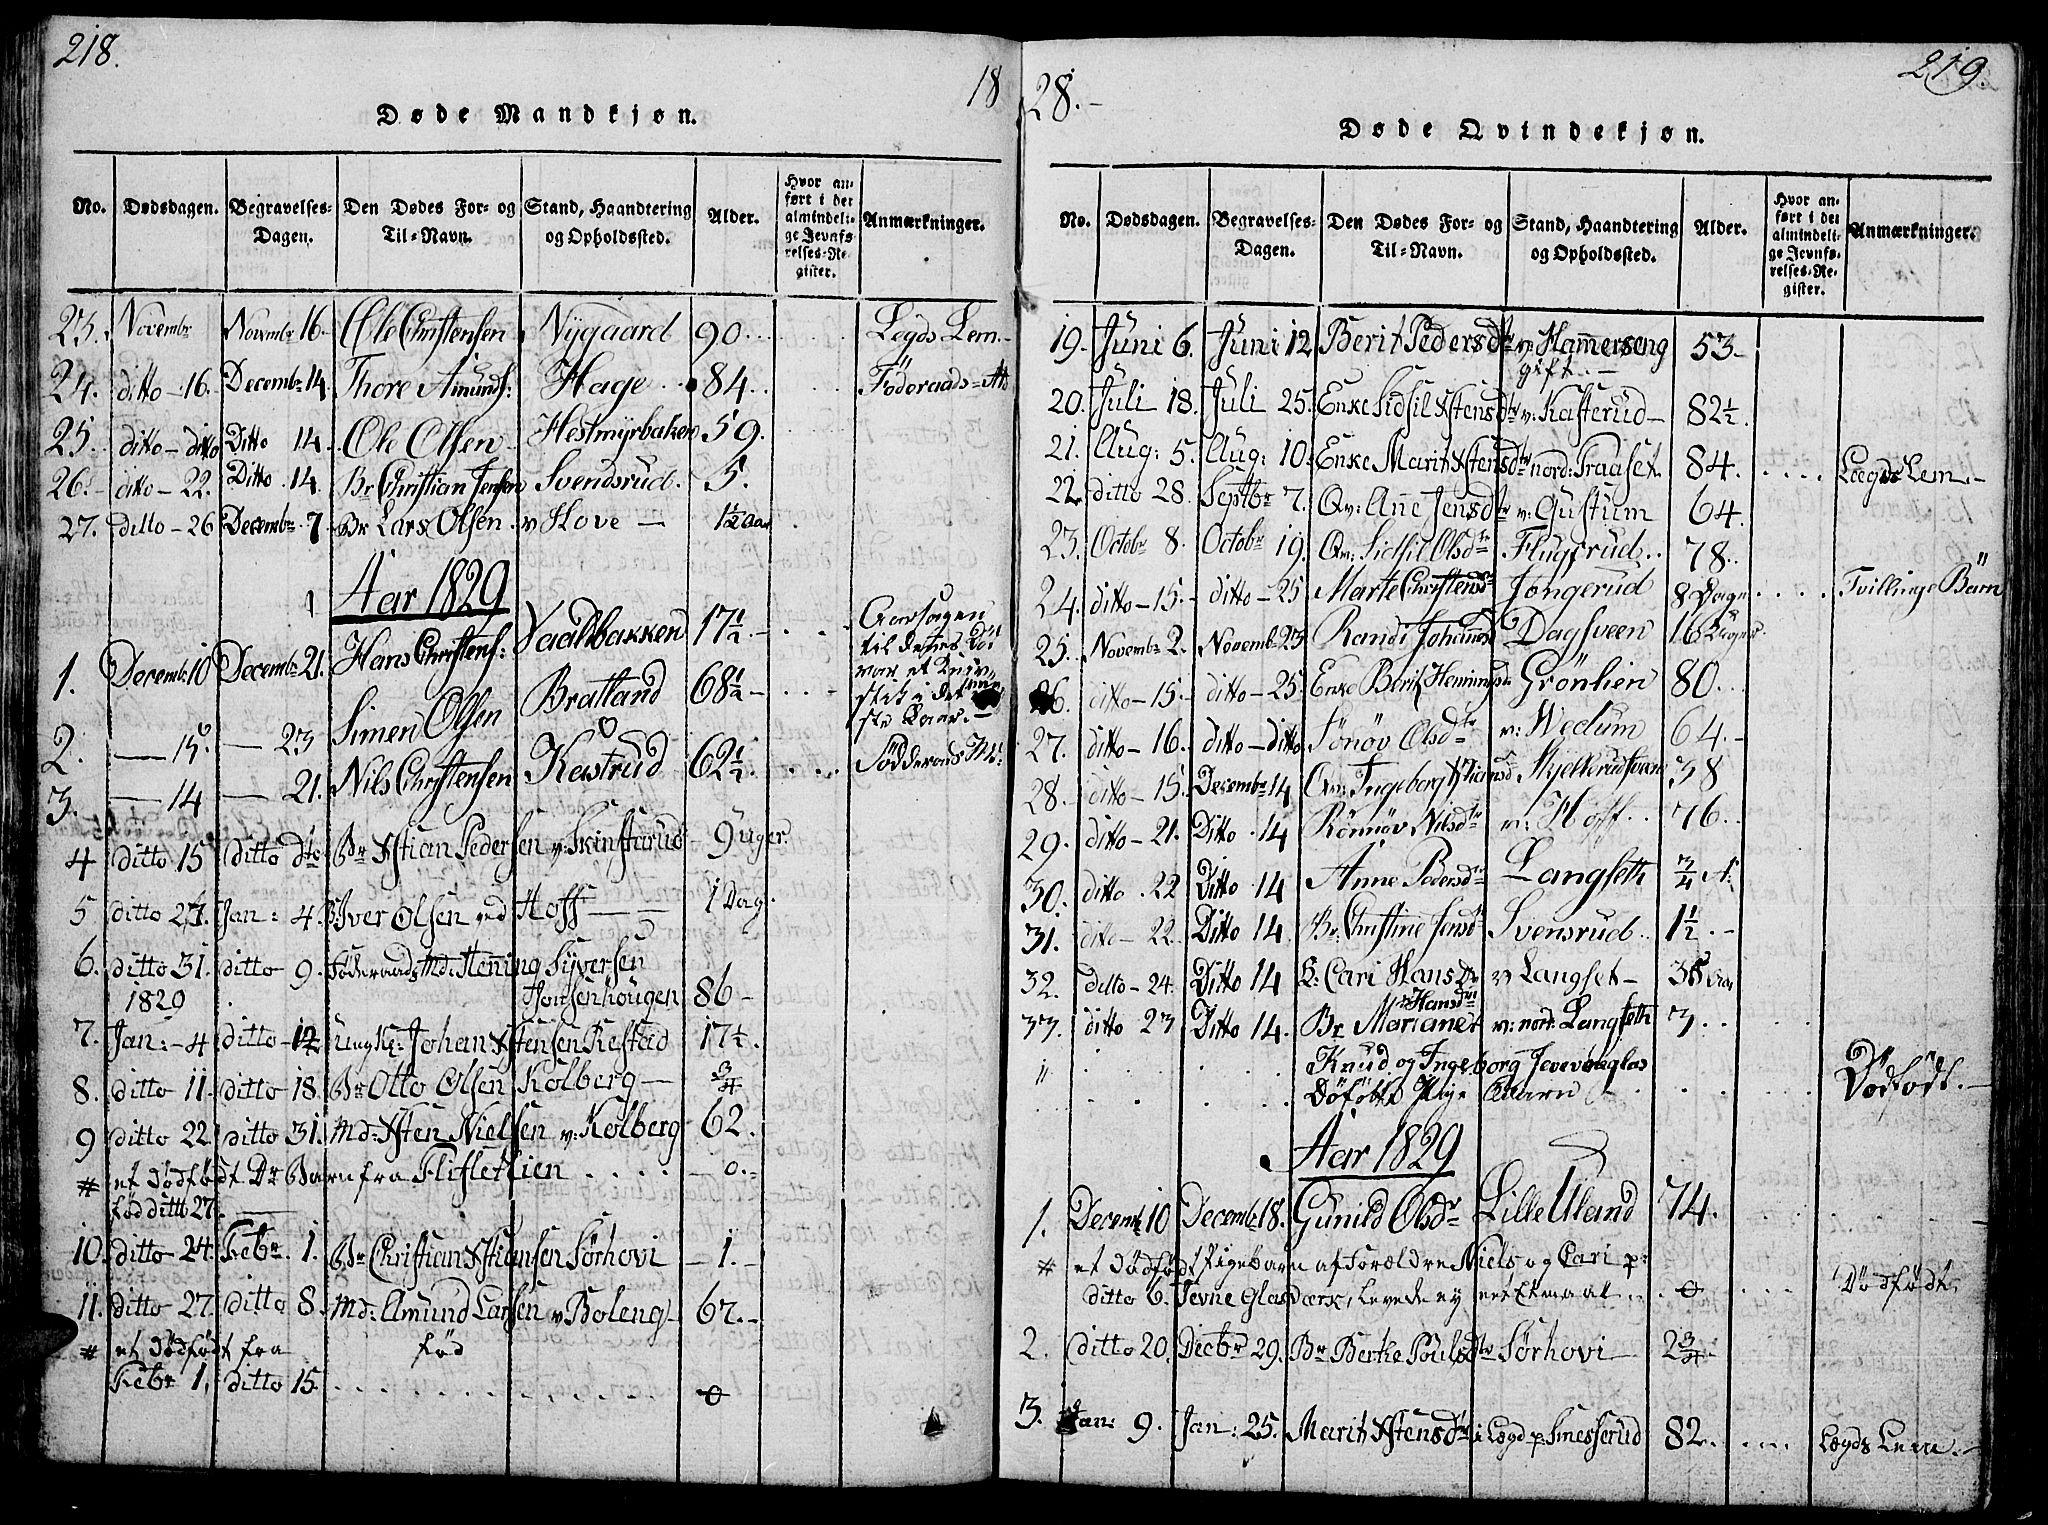 SAH, Fåberg prestekontor, Klokkerbok nr. 4, 1818-1837, s. 218-219